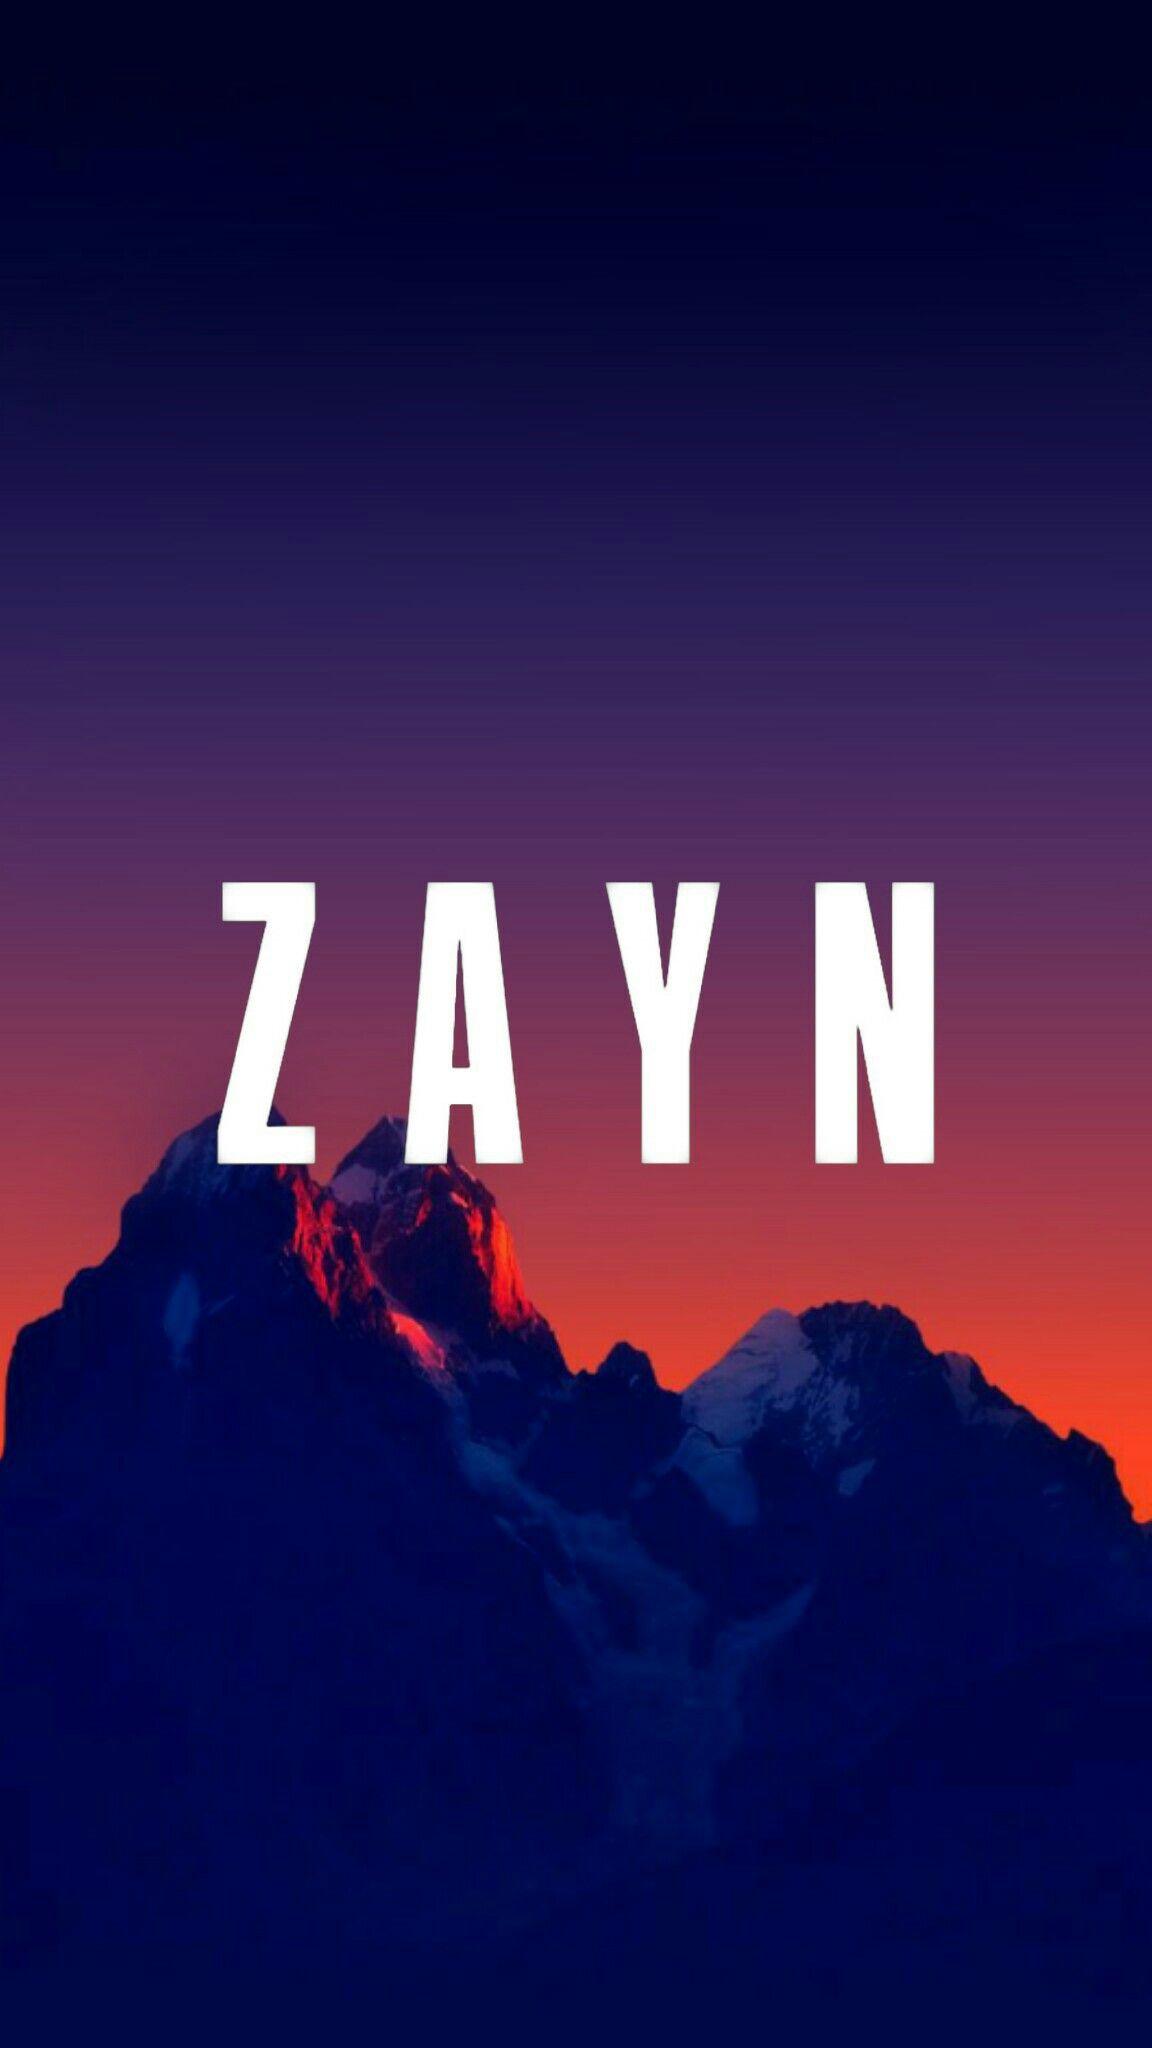 Pin By Sahina On Zayns Lyricslockscreen In 2019 Pinterest Zayn